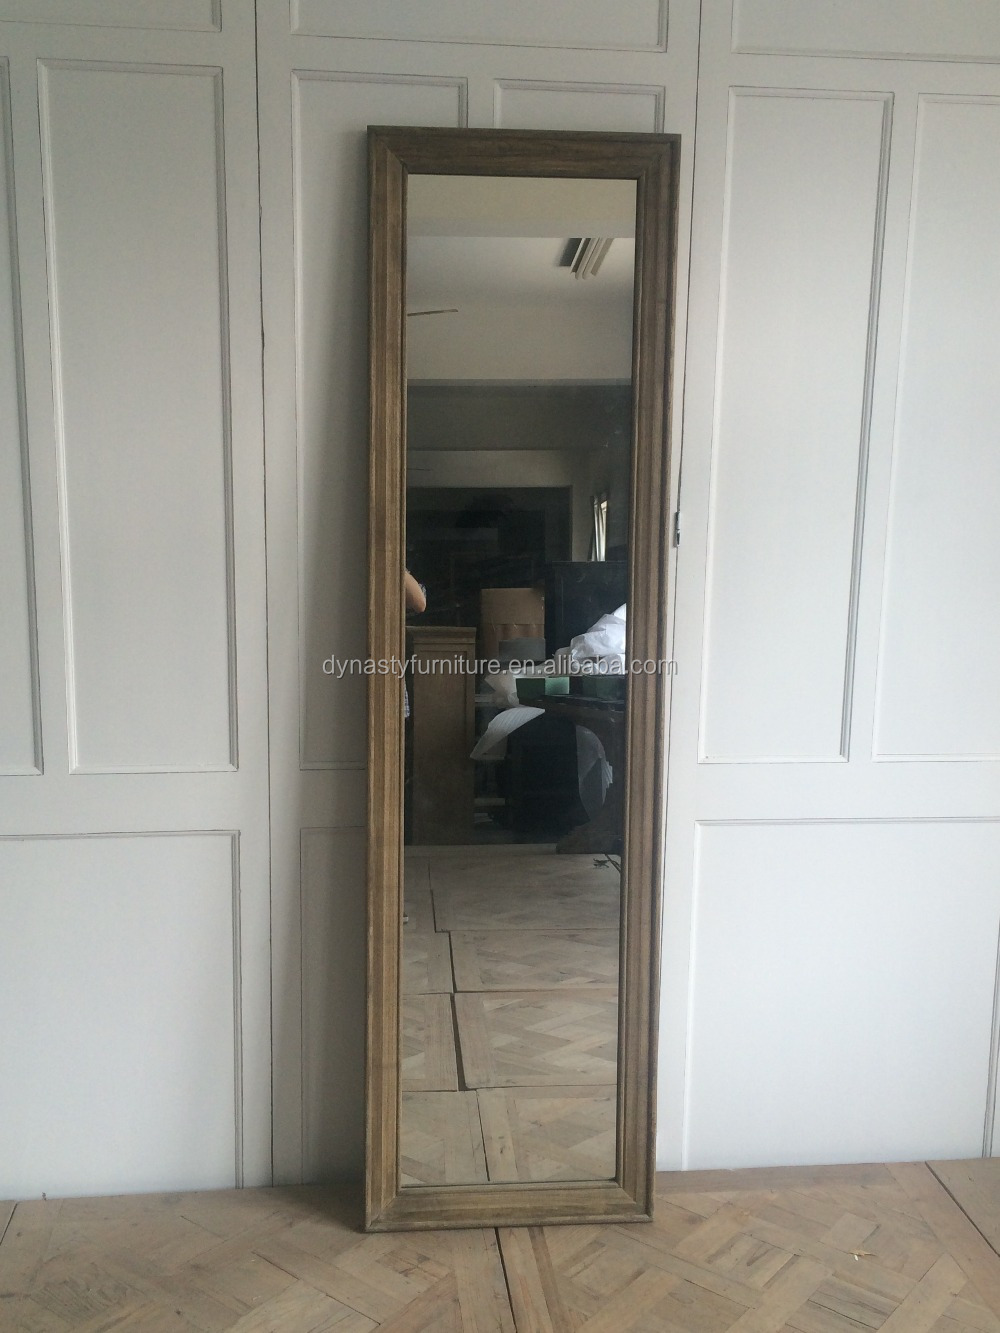 Decoratieve smaakvolle houten badkamer muur spiegel spiegels product id 60519259470 dutch - Decoratieve spiegel plakken ...